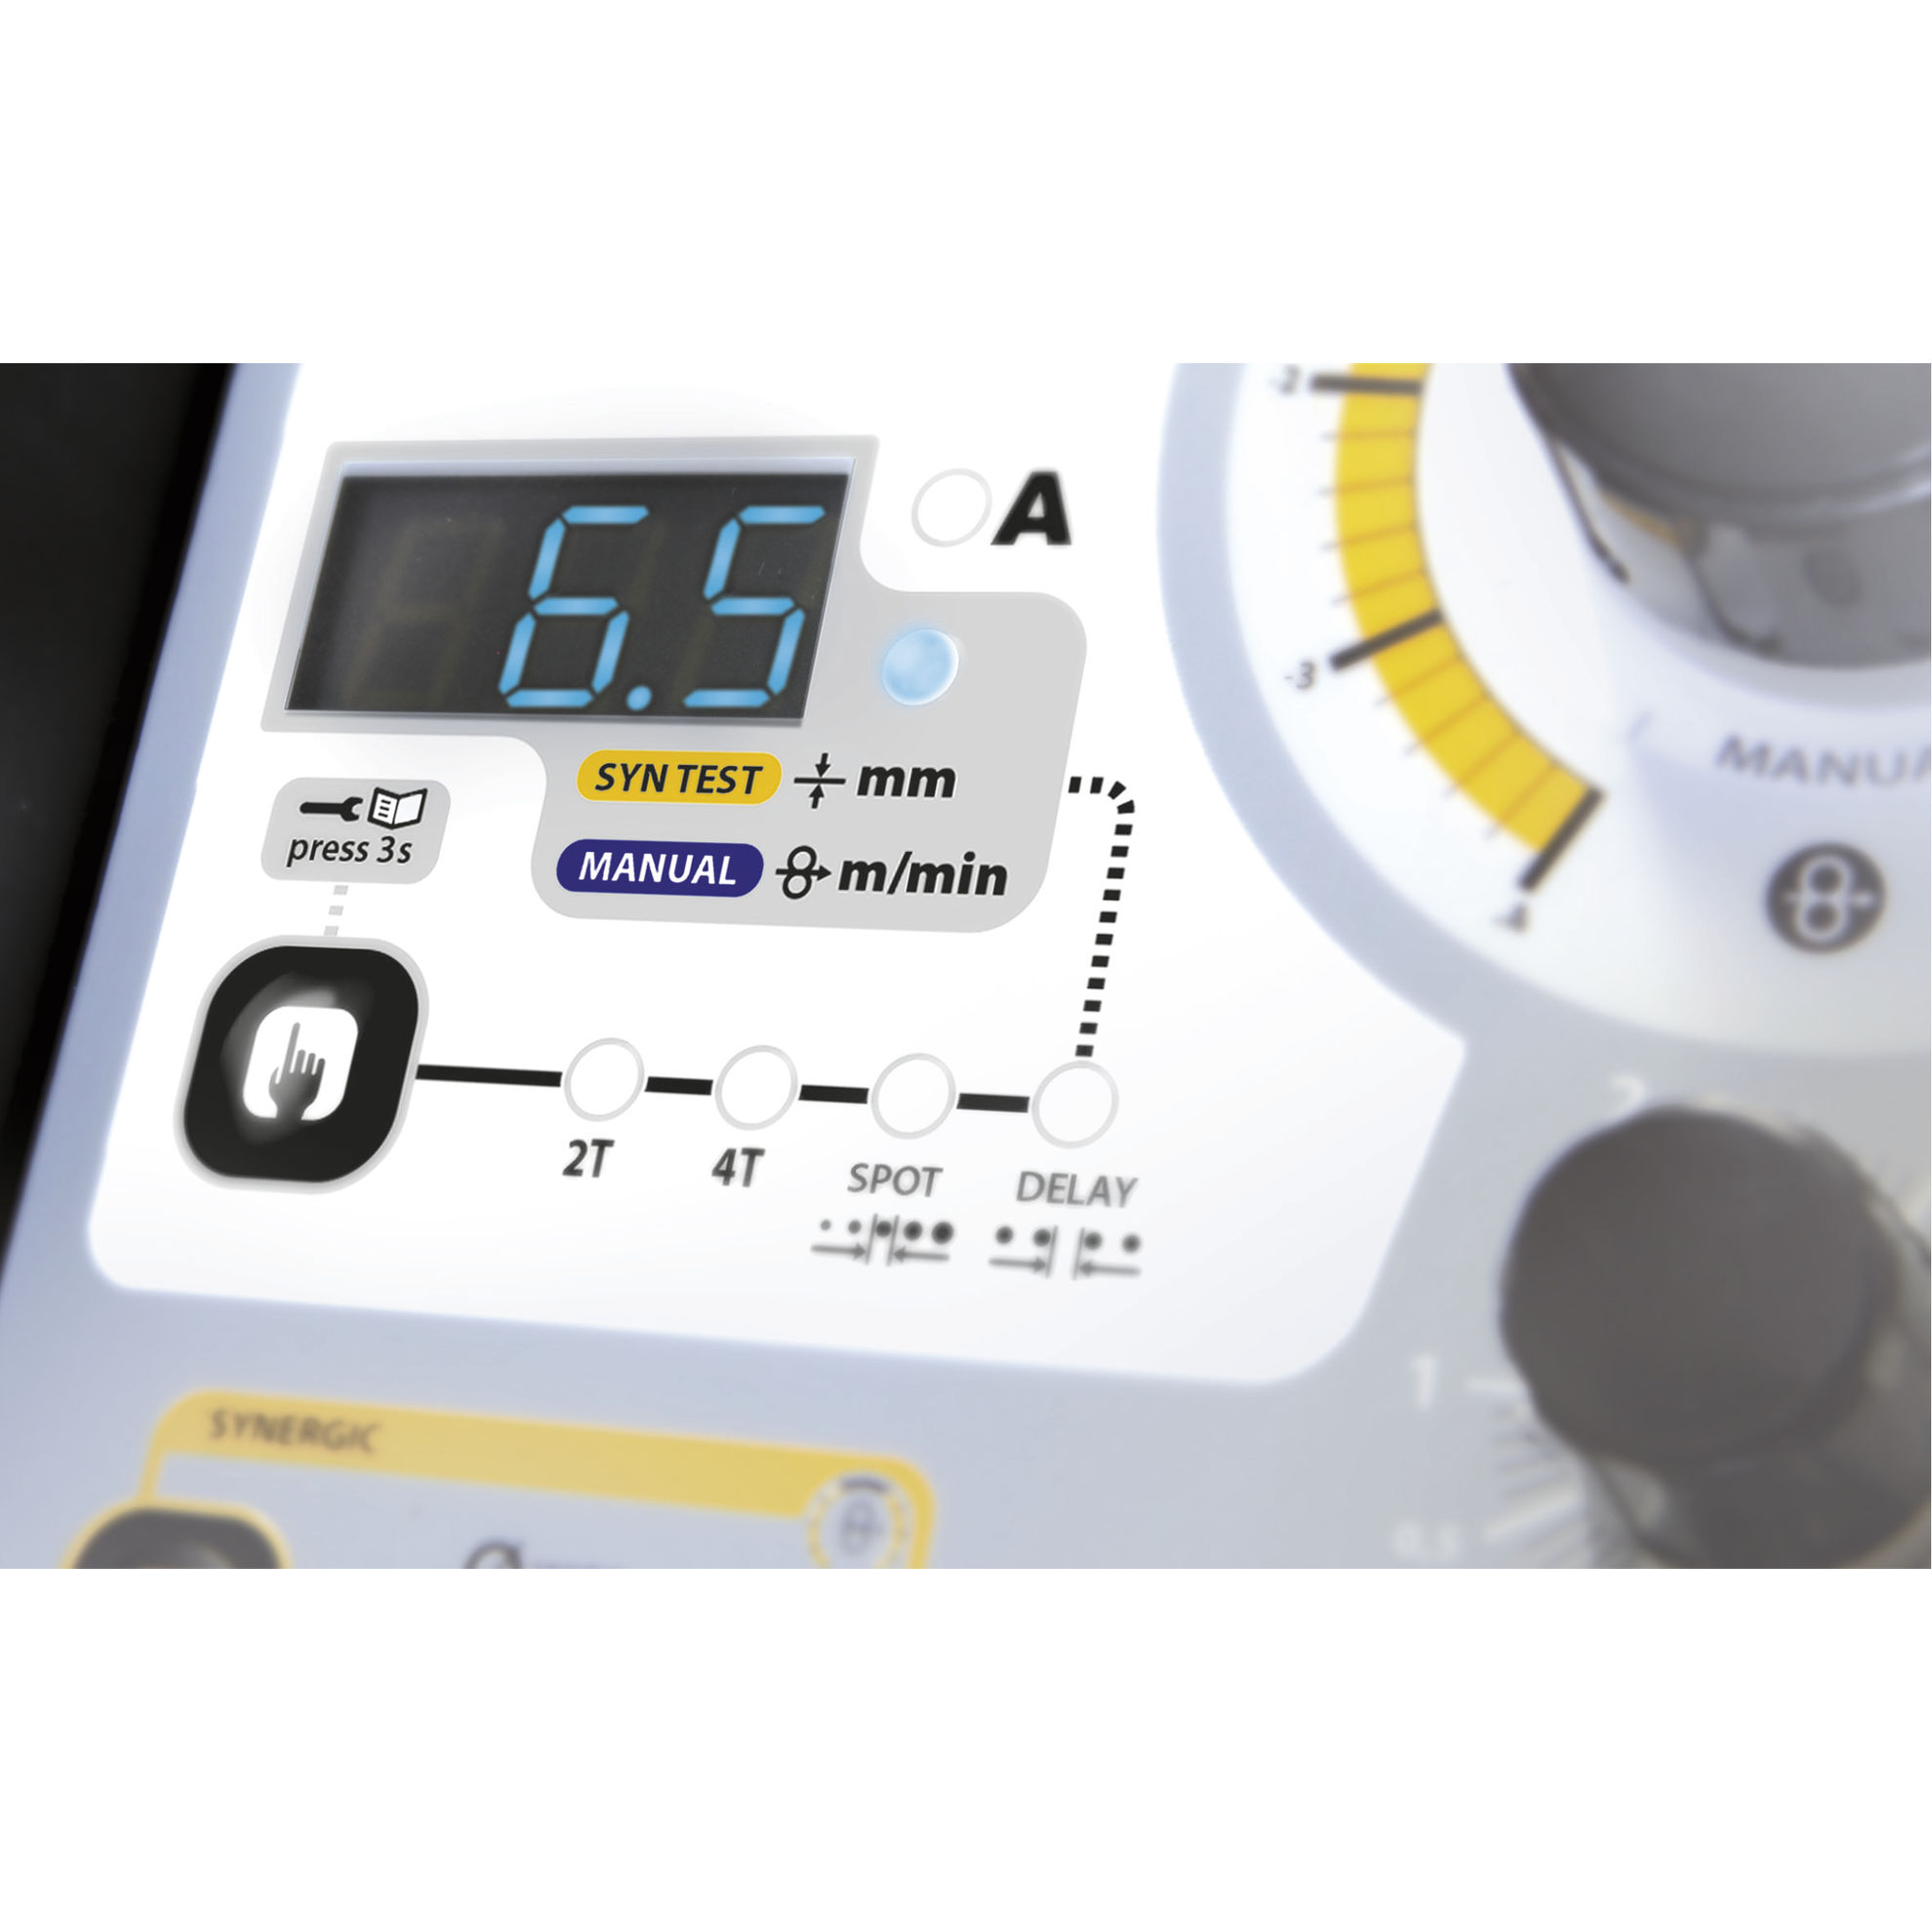 Slika Varilni aparat GYS, MAGYS 500 WS, brez opreme